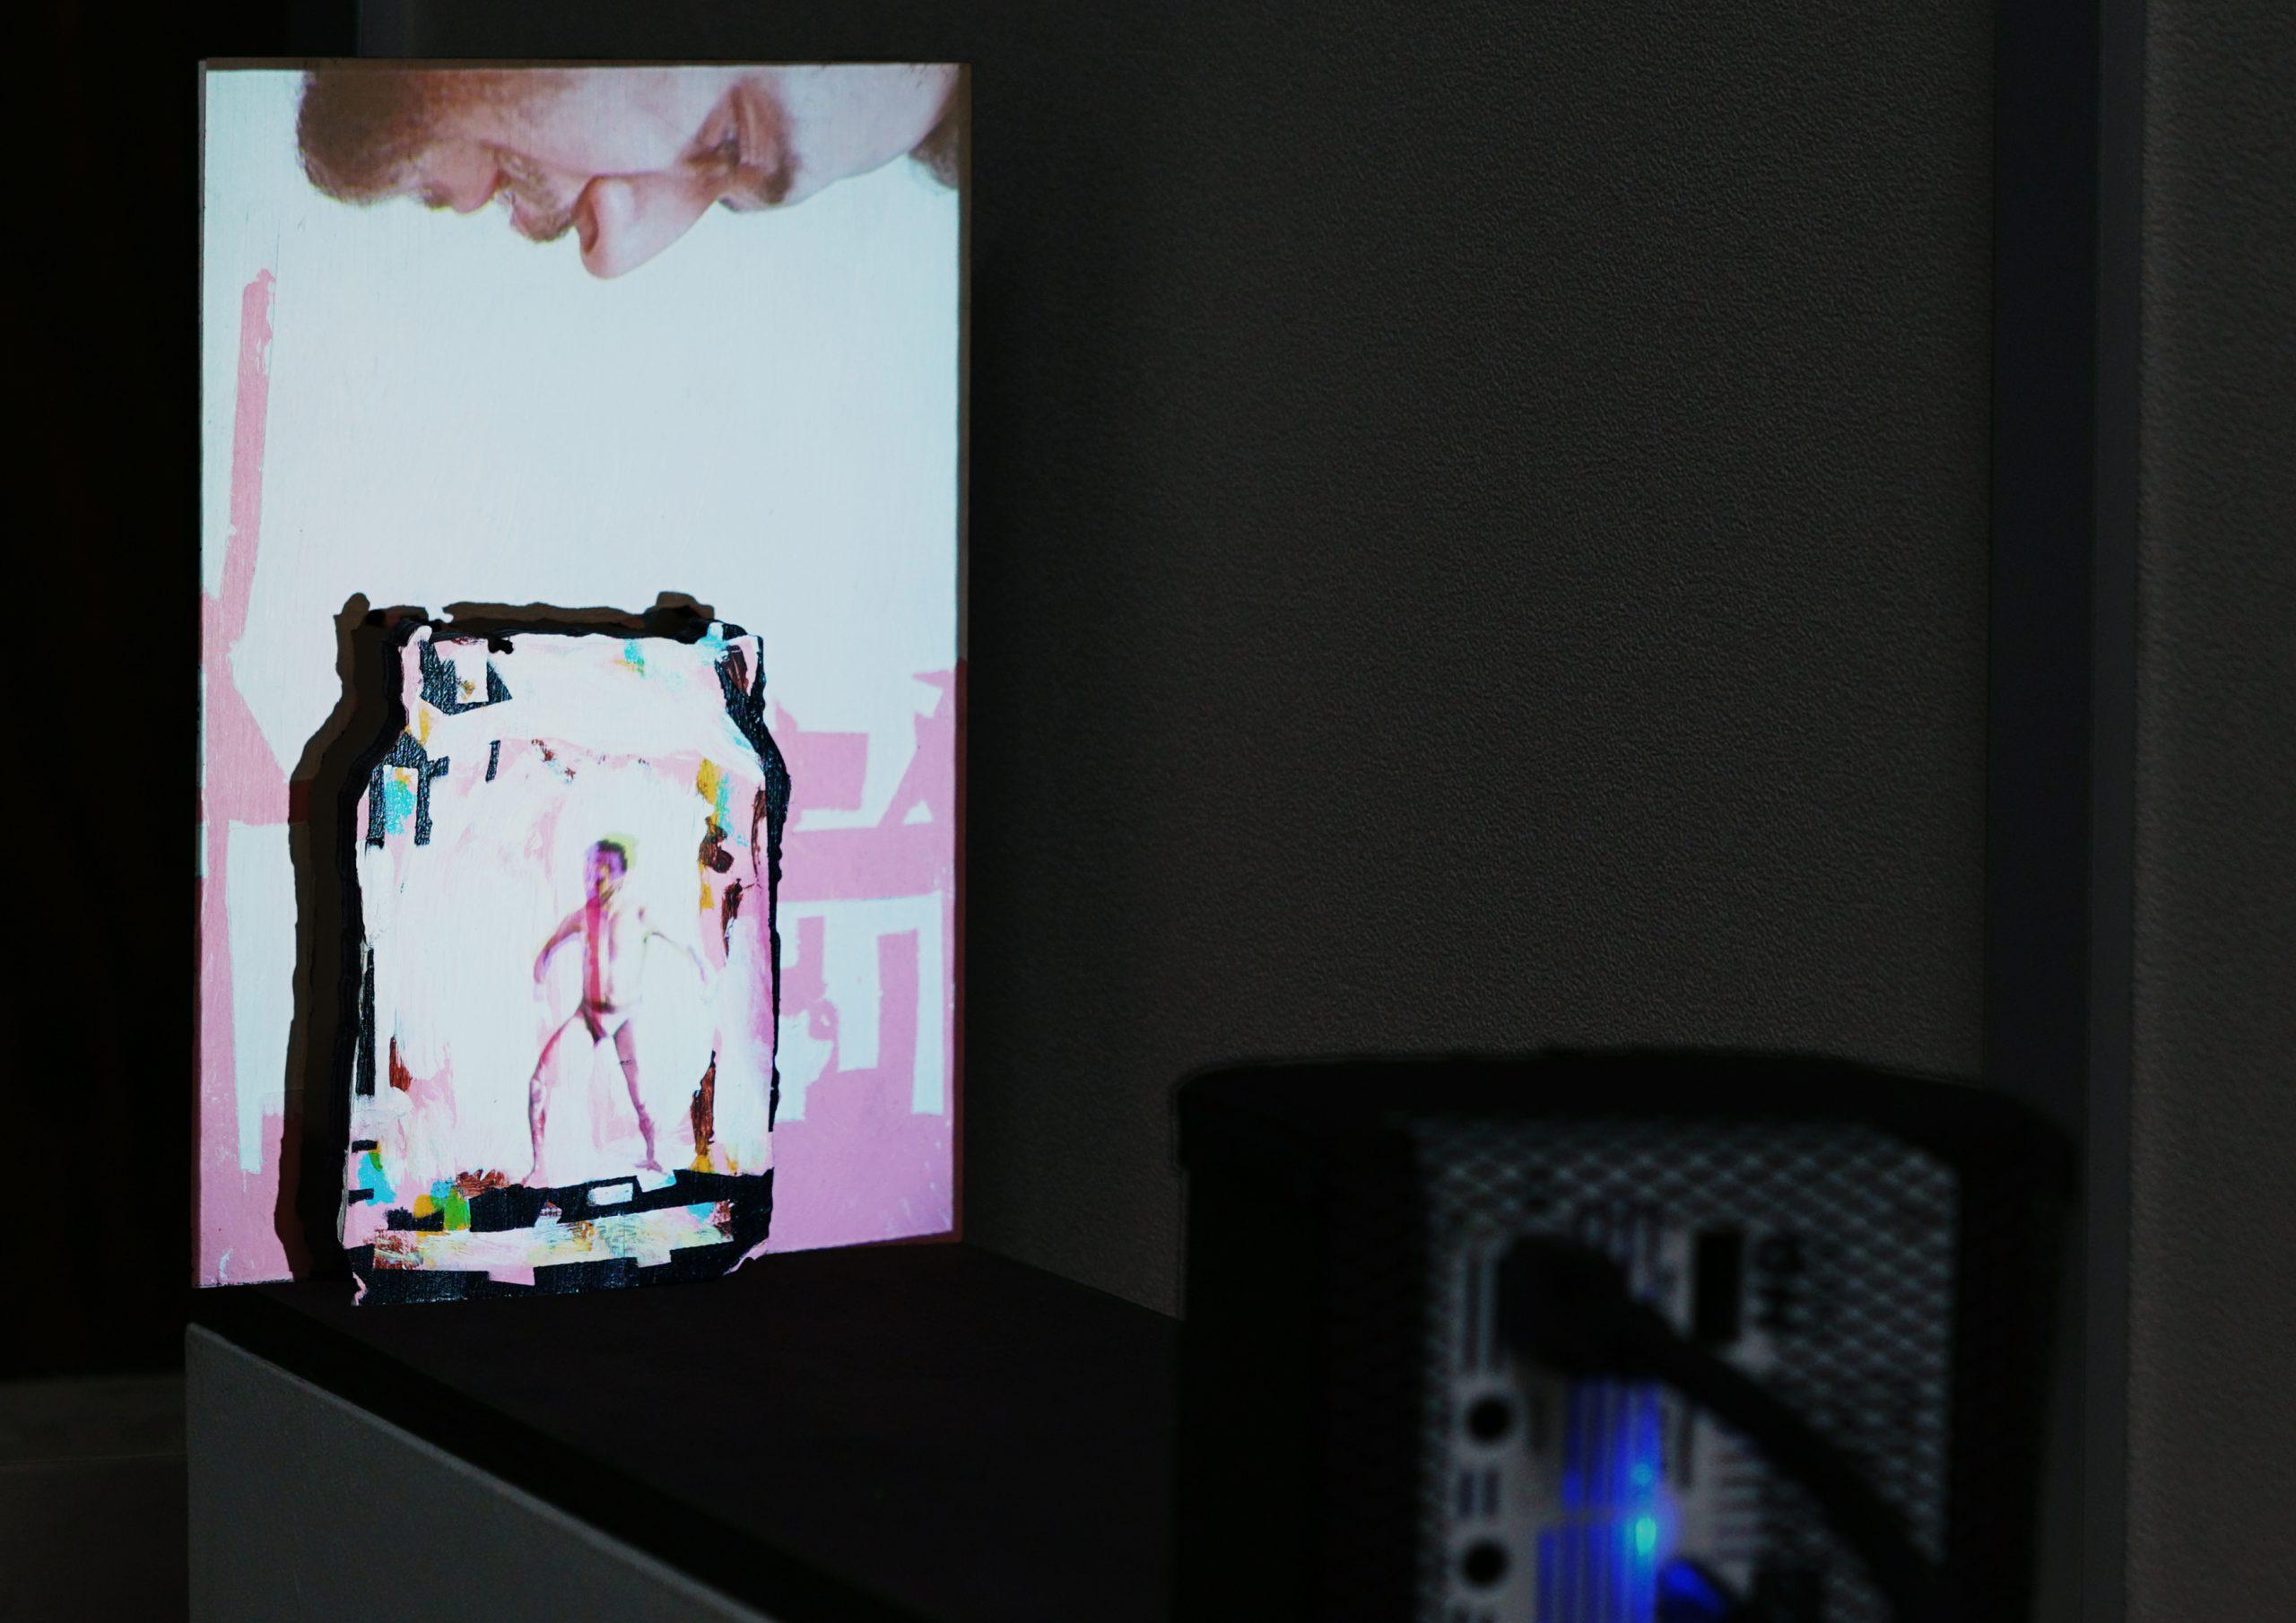 Roy Efrat, Jar, 2019, acrylic on plywood, mini HD projector, single channel video with sound, 5 0x 11.8 x 19 cm